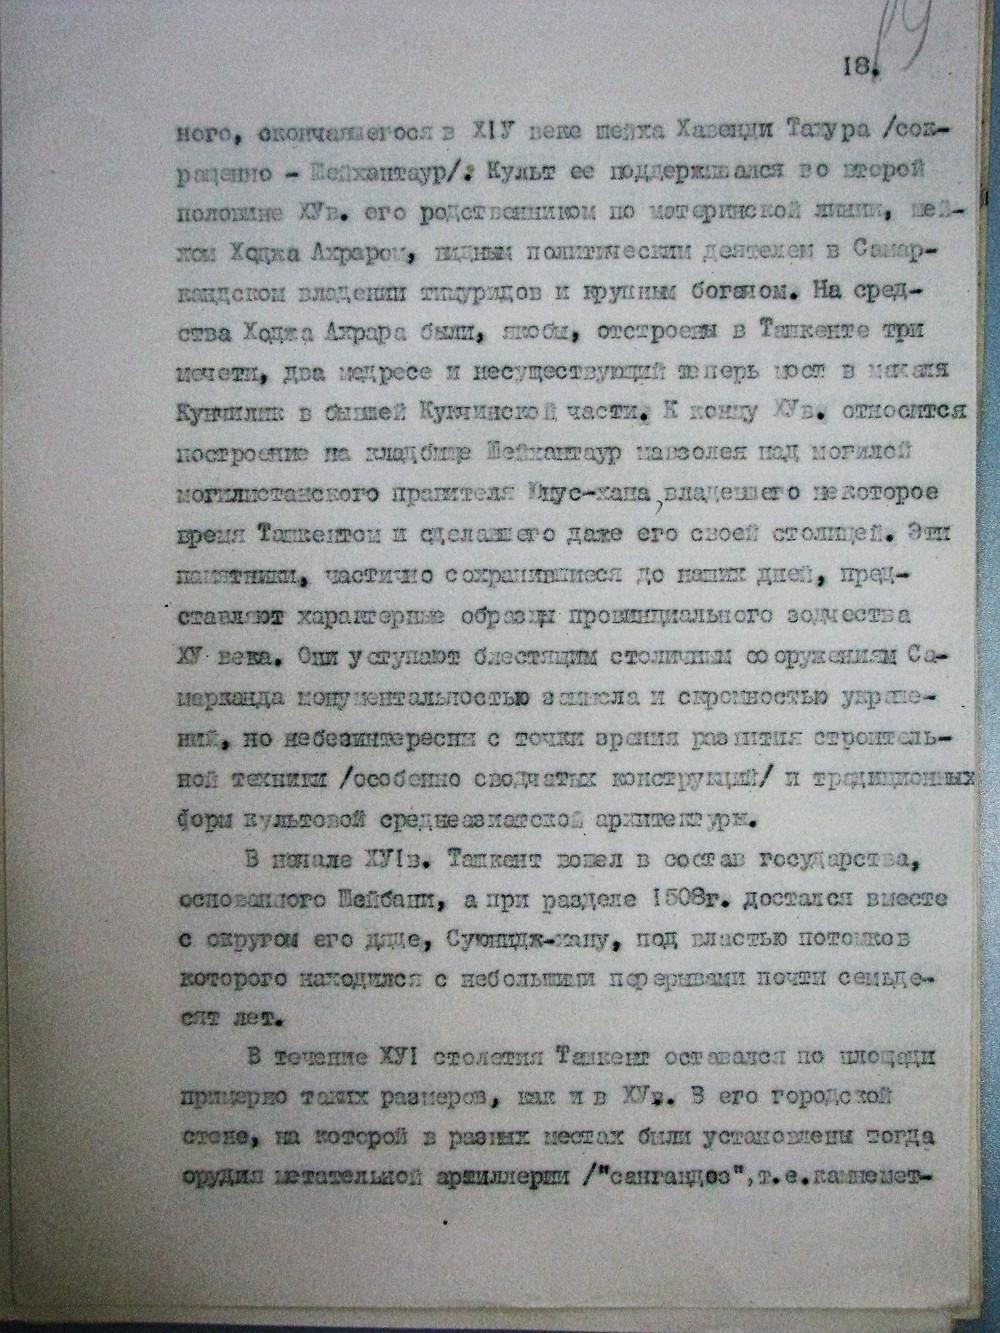 Ташкент, Массон (17)